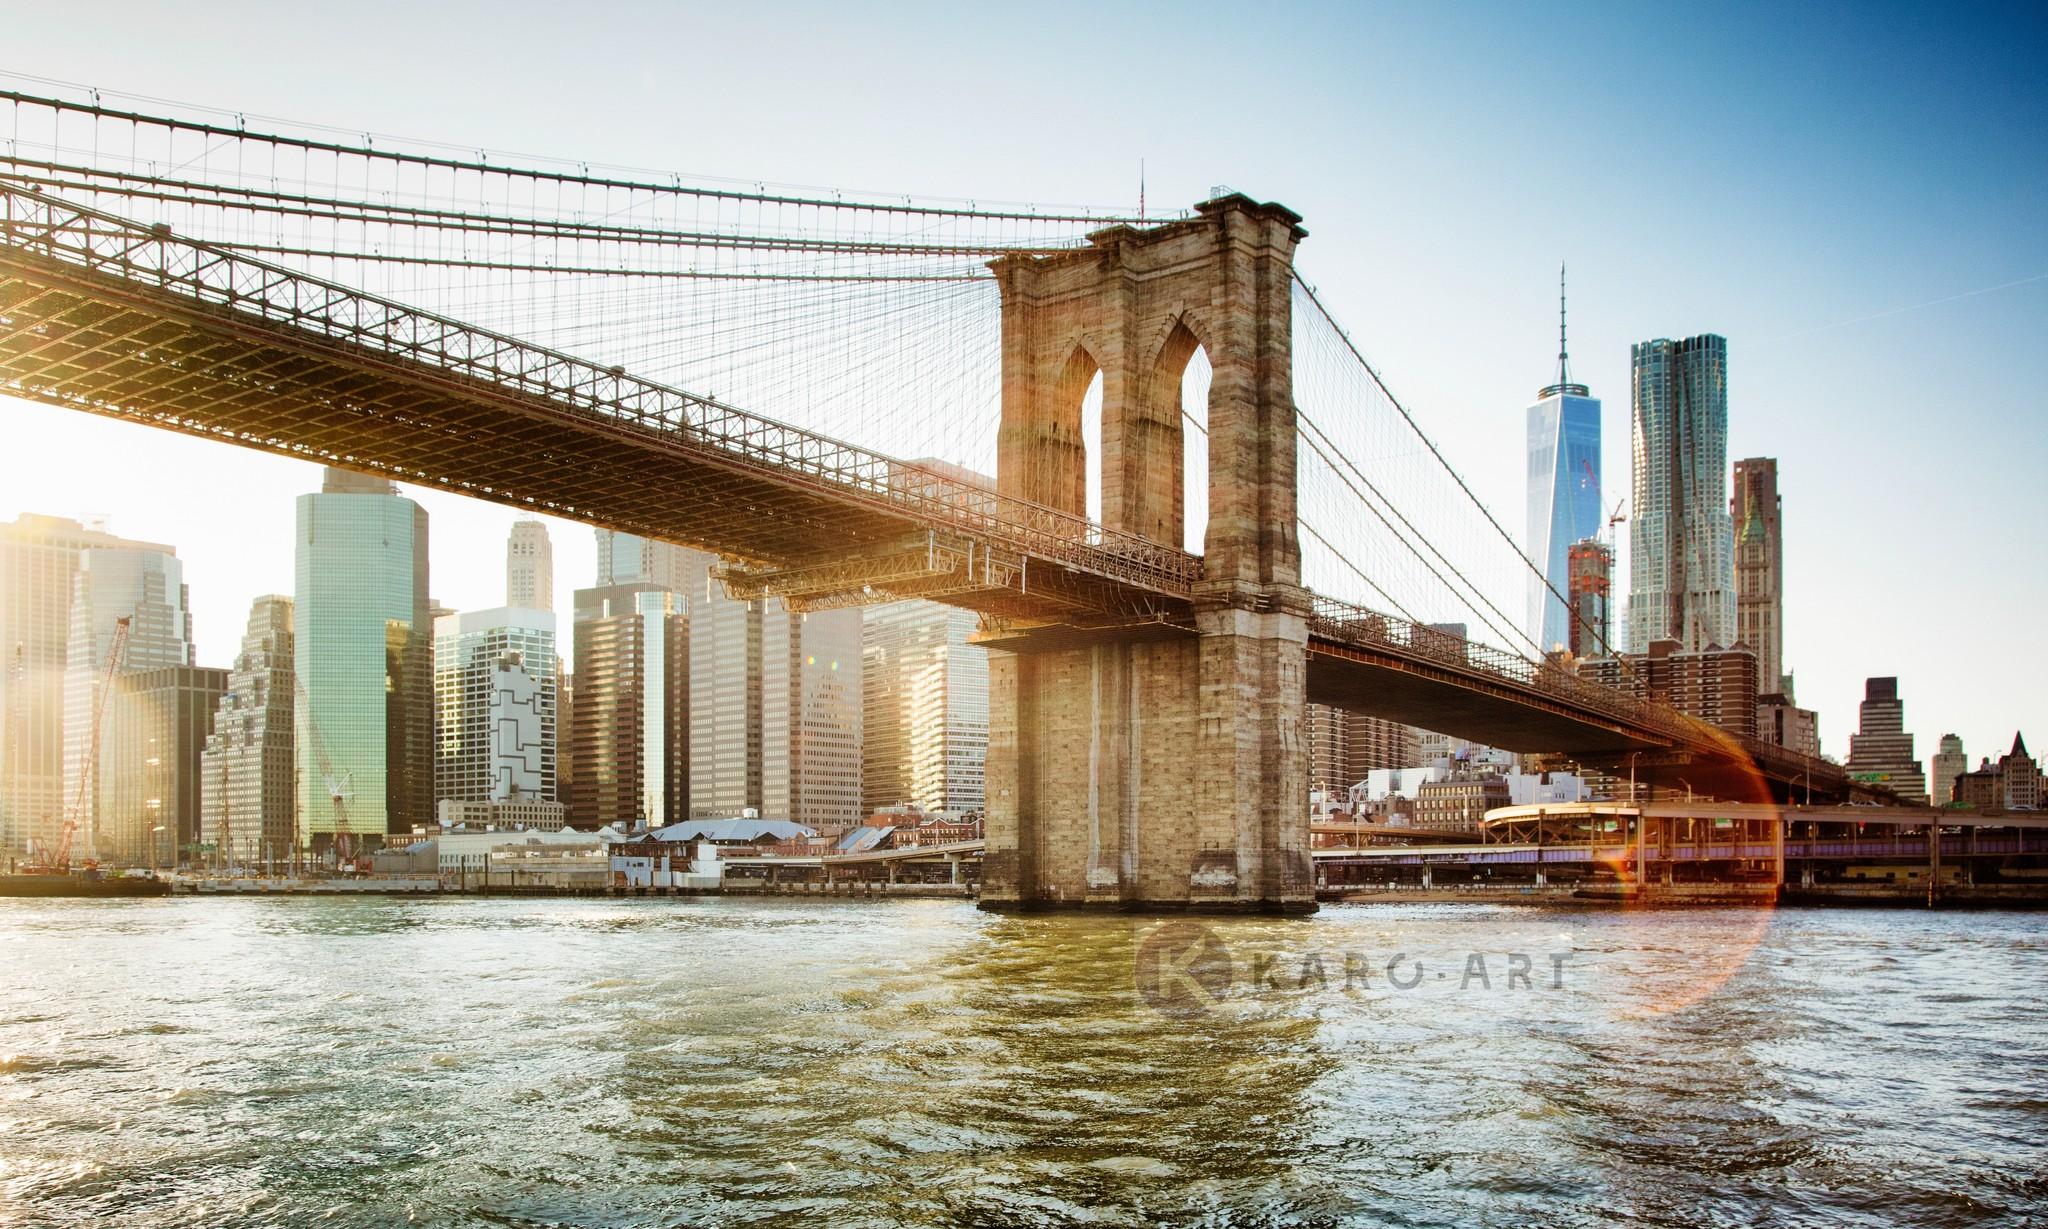 Karo-art Schilderij - Brooklyn Bridge, New York, Multikleur , 3 maten , Wanddecoratie